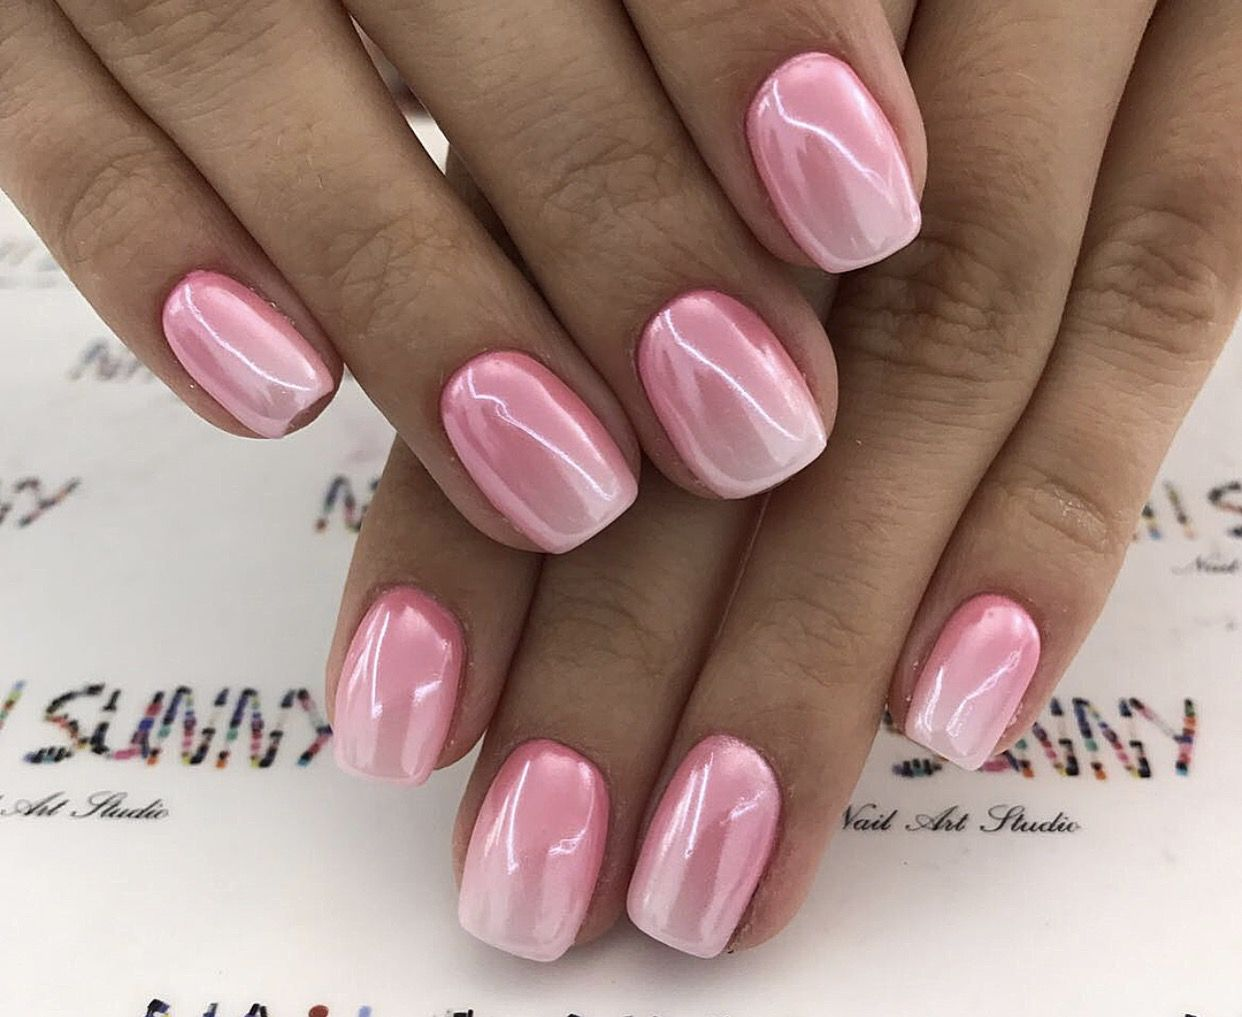 Pin By Zdenka On Nails Pink Nails Nails Best Acrylic Nails